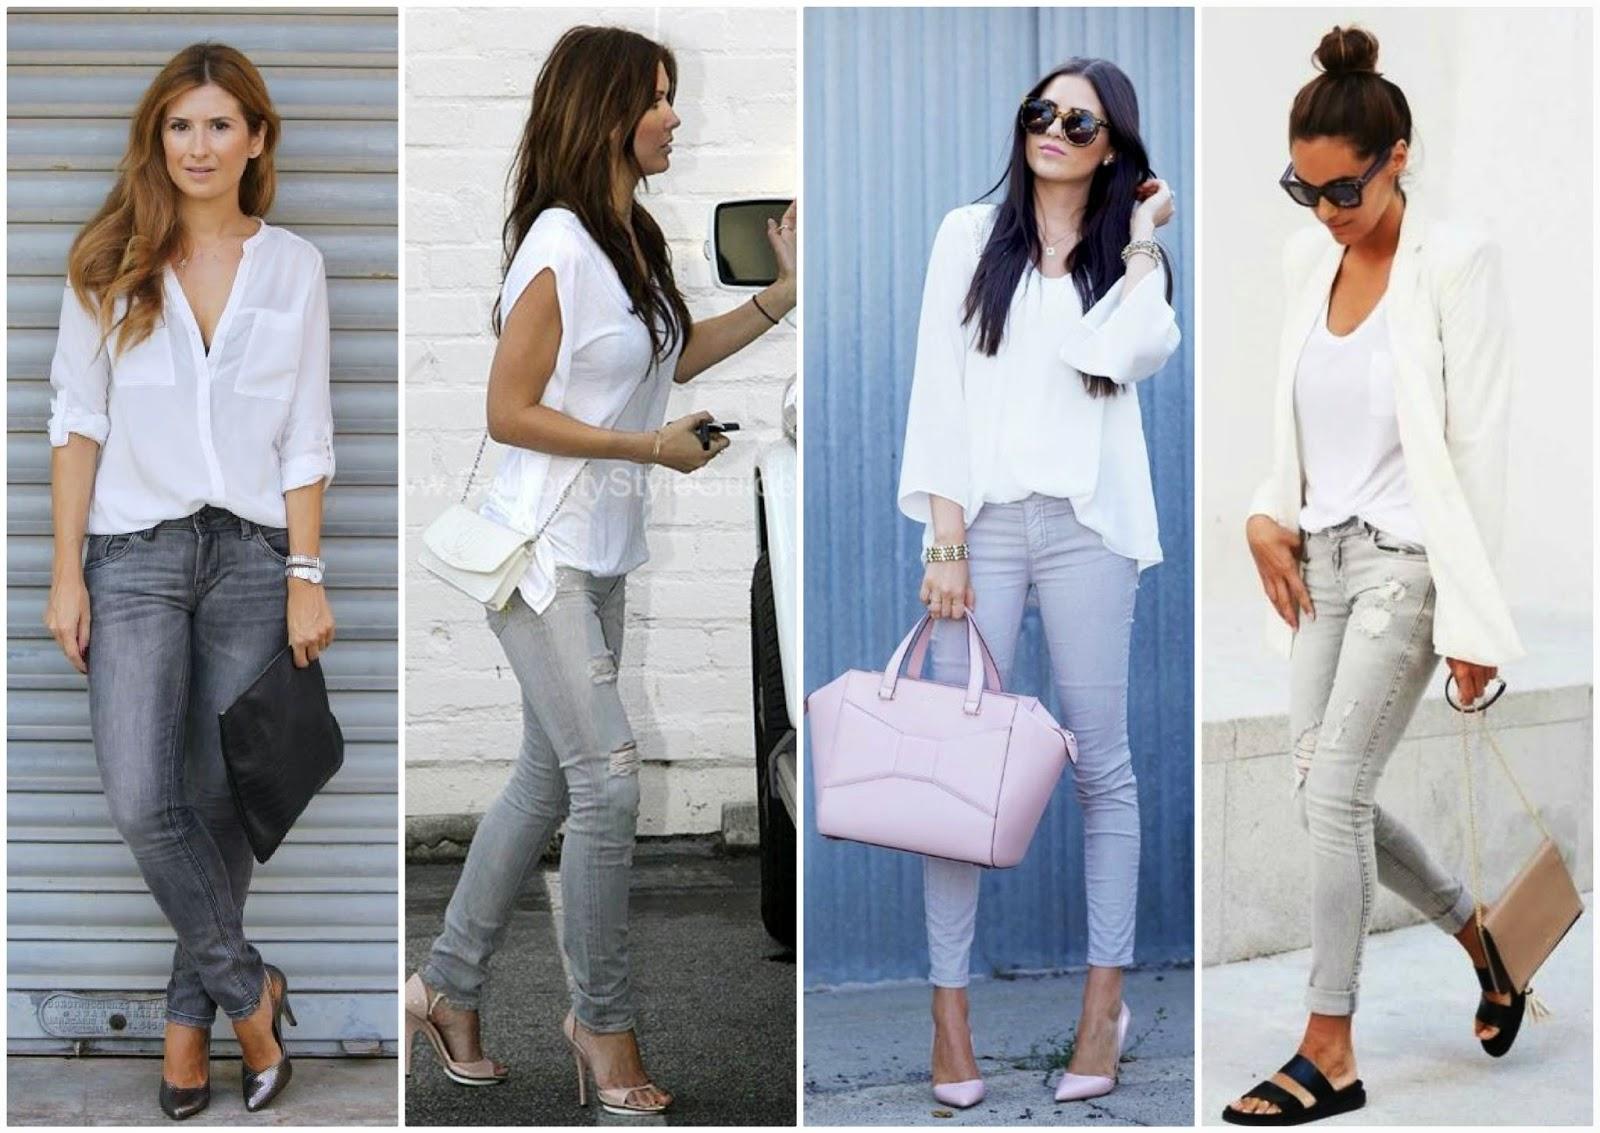 c2f9496beb3a Option Three  White Top + Grey Jeans